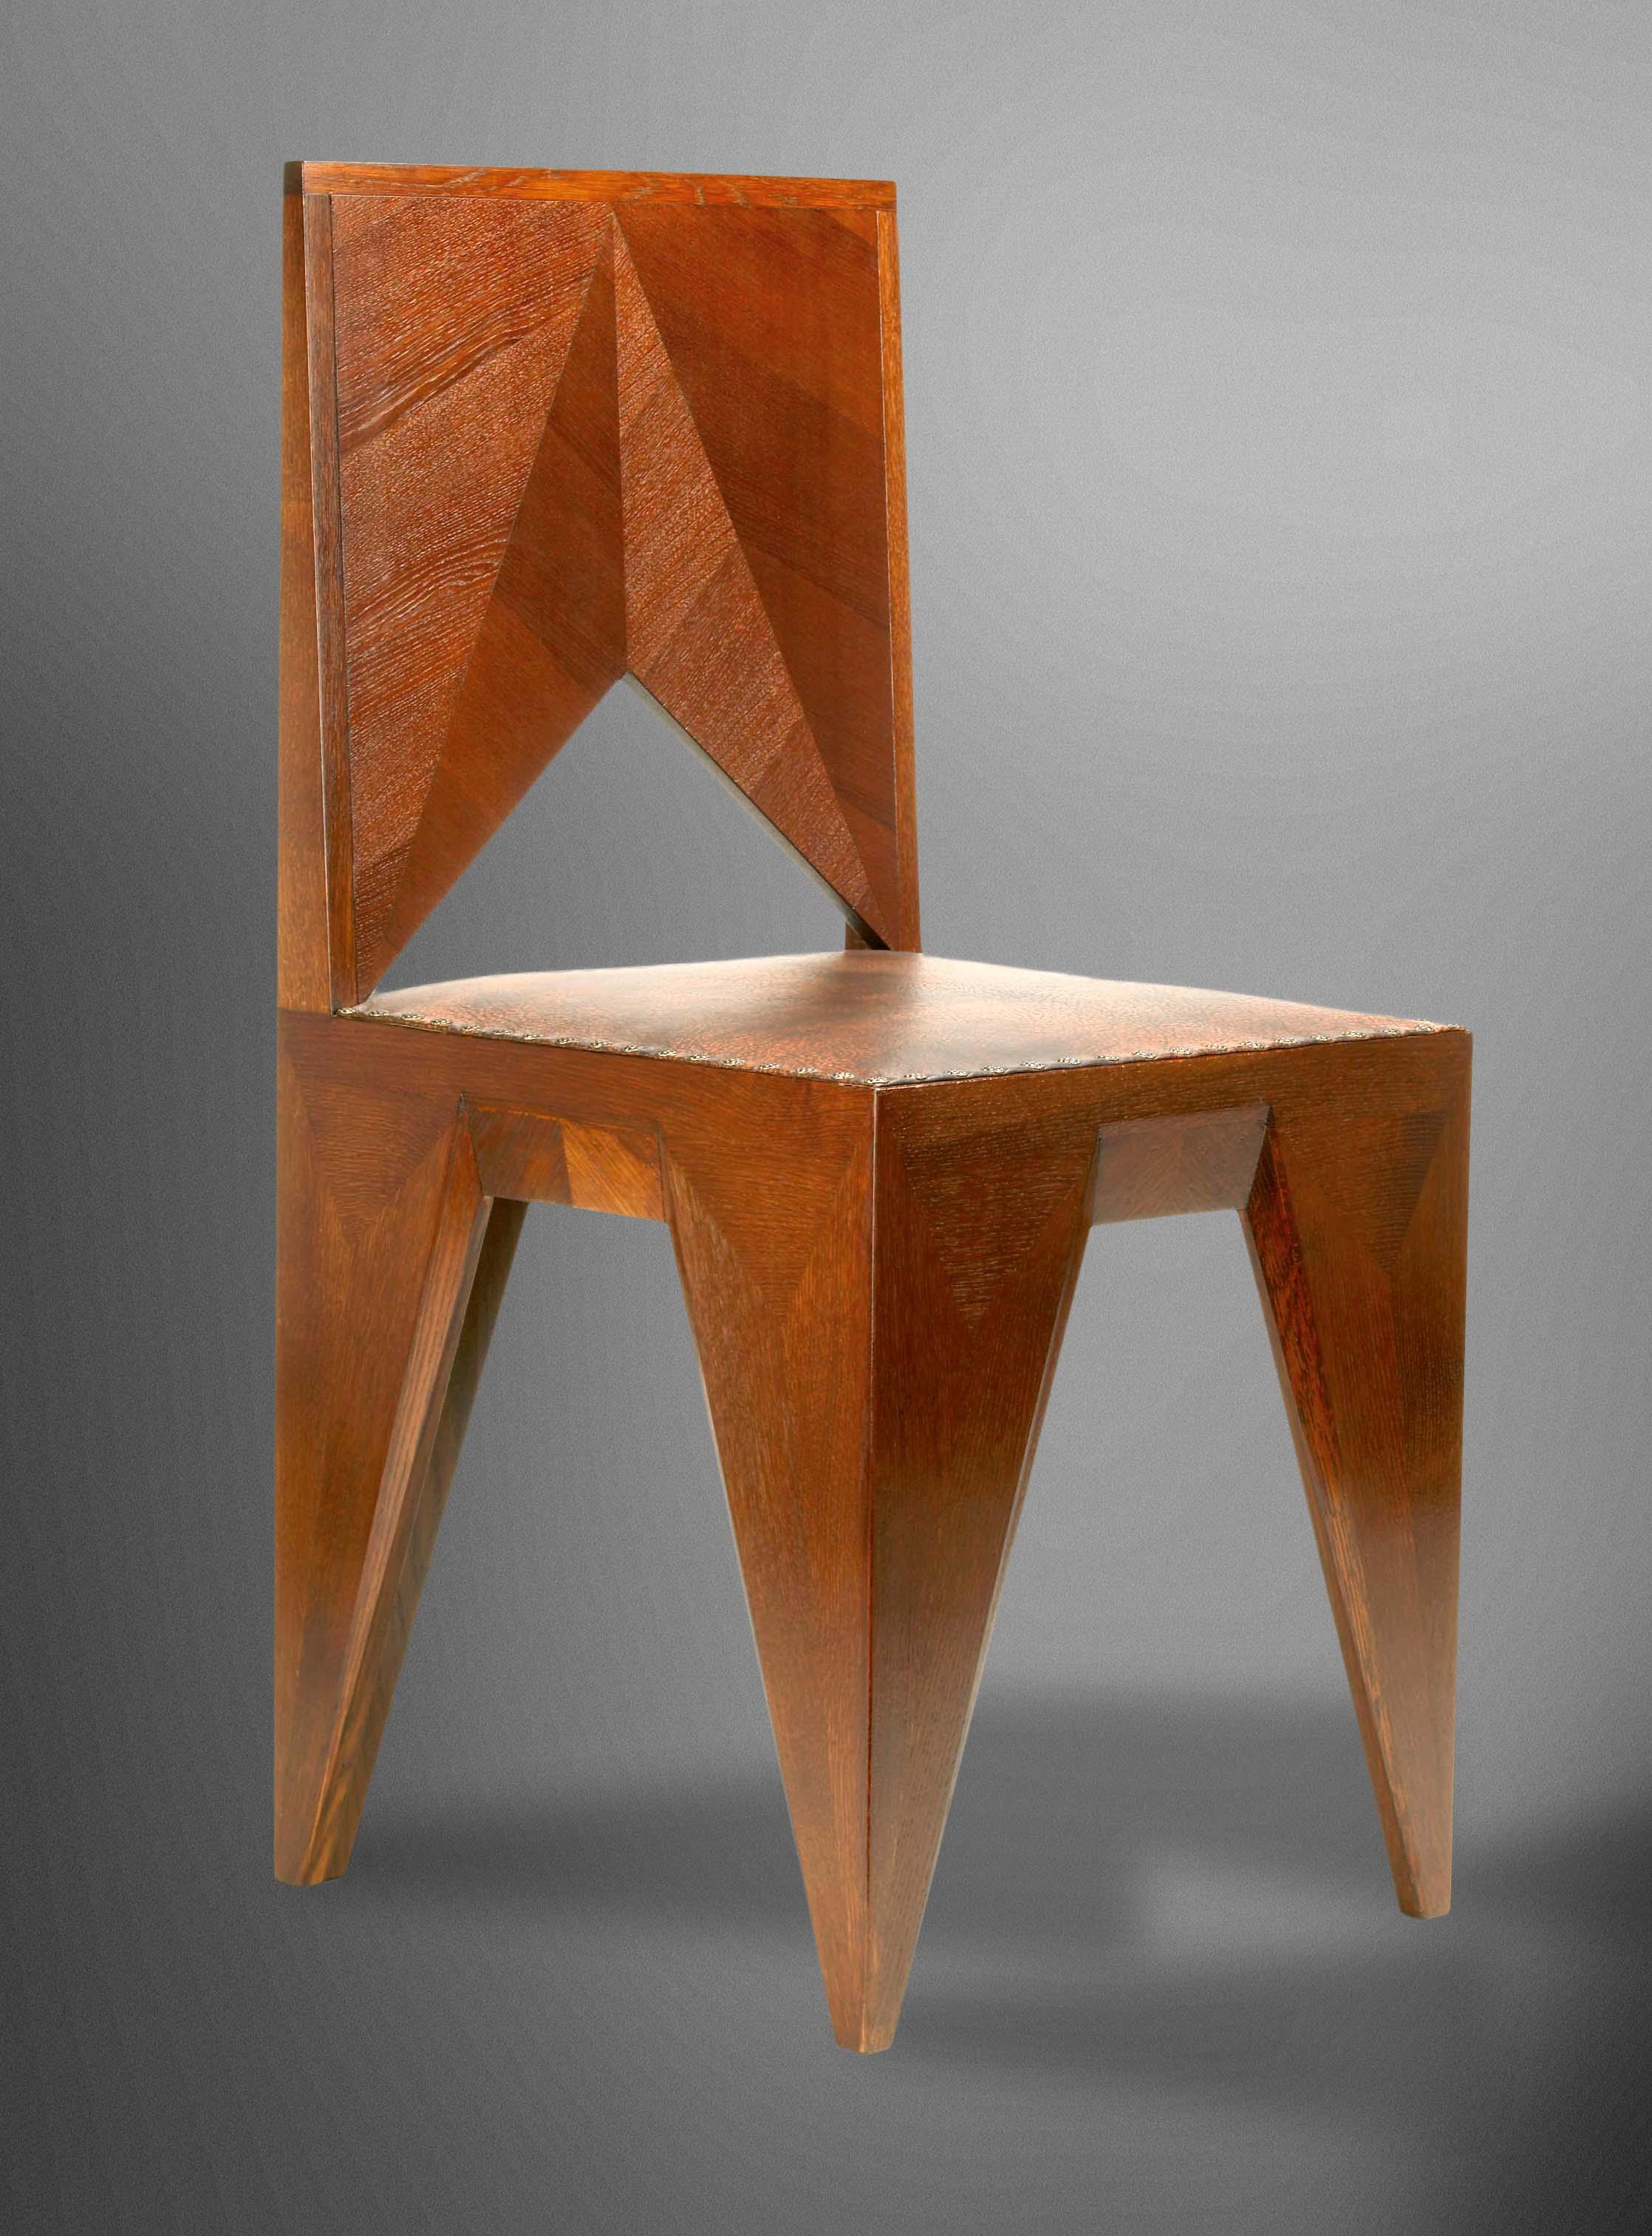 hofman_chair small_SP